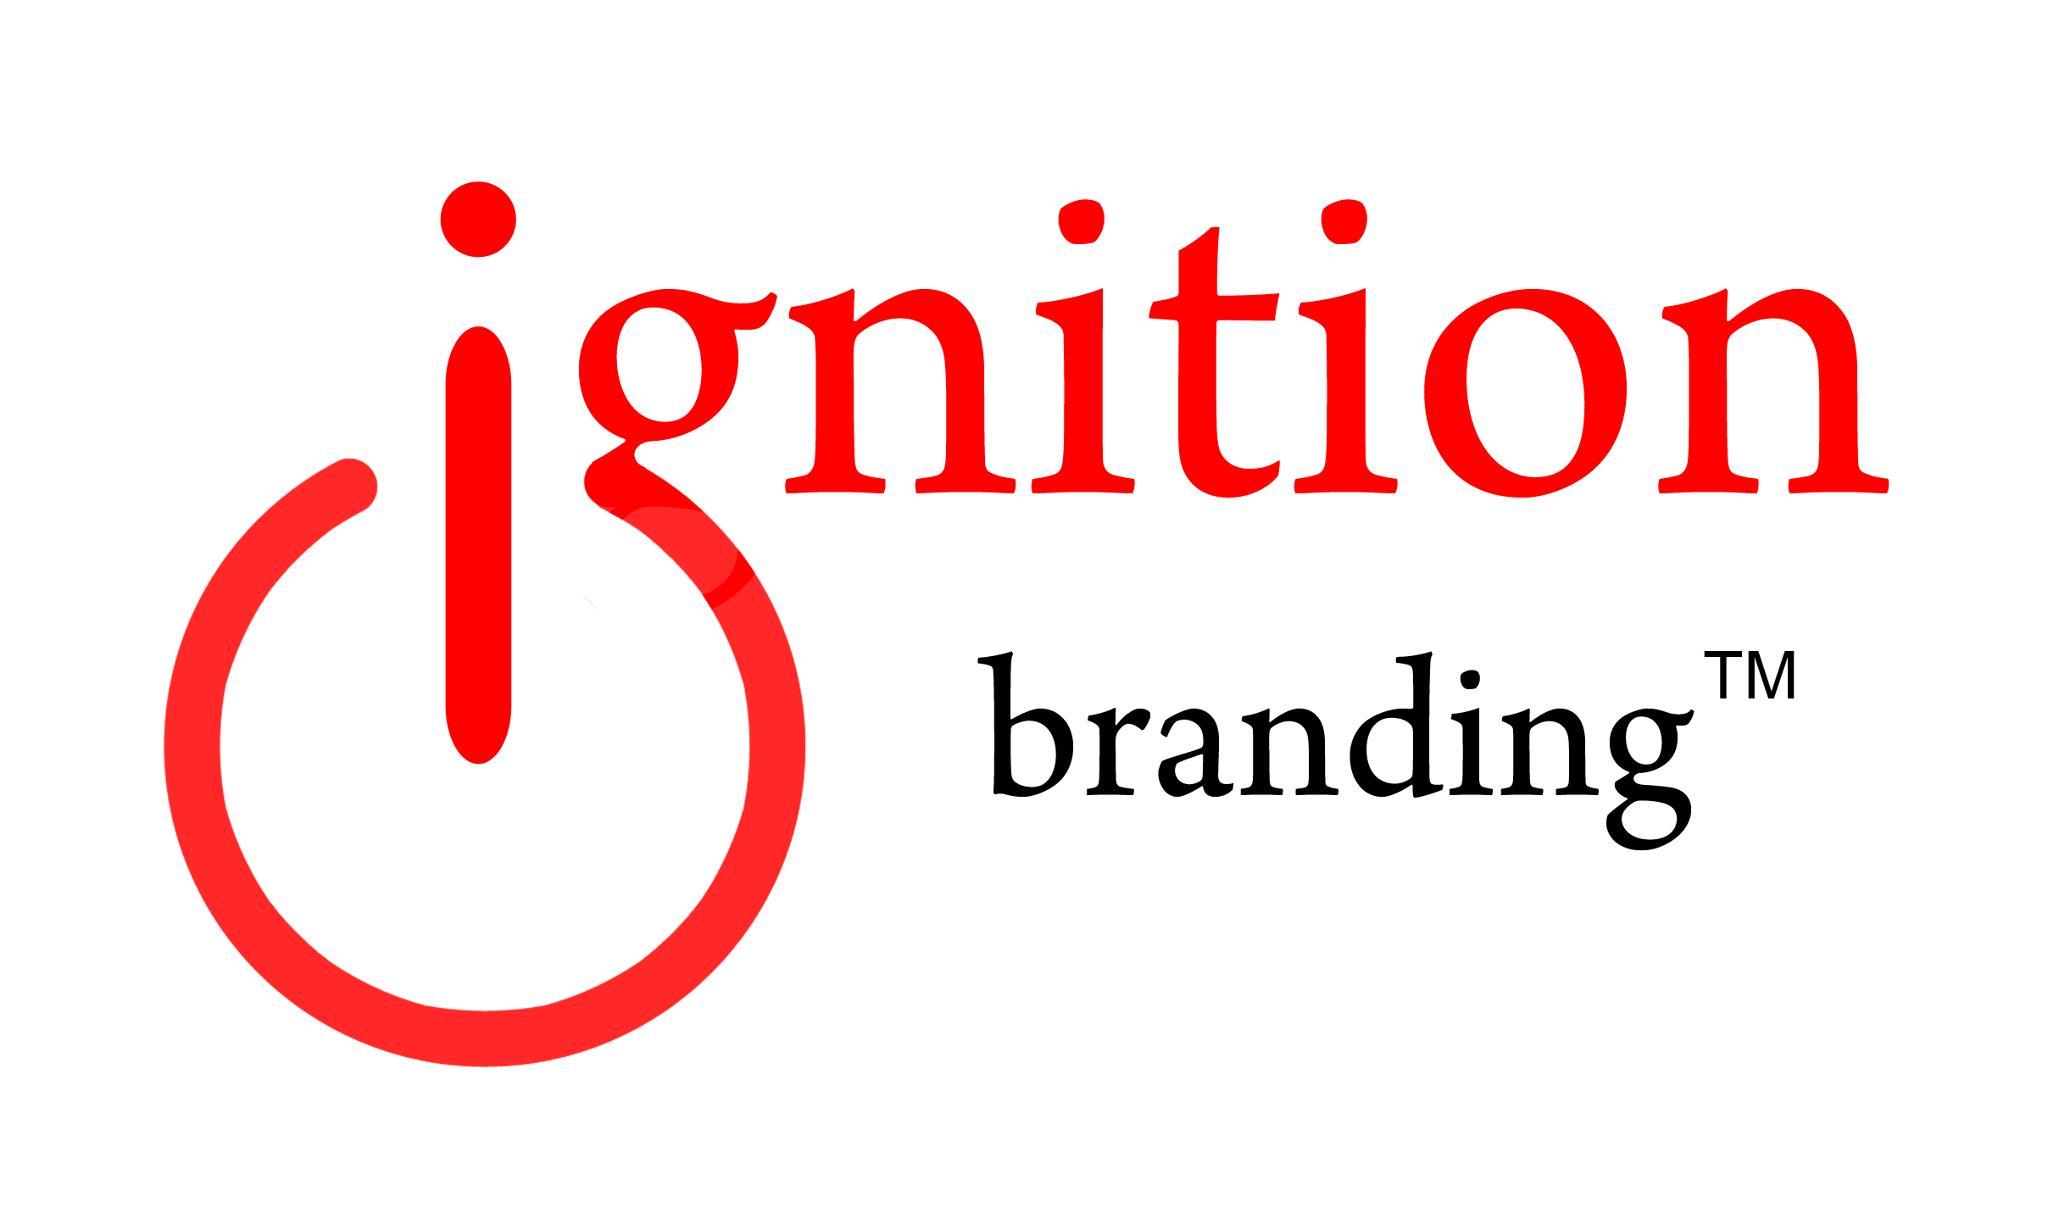 600-Ignition Branding